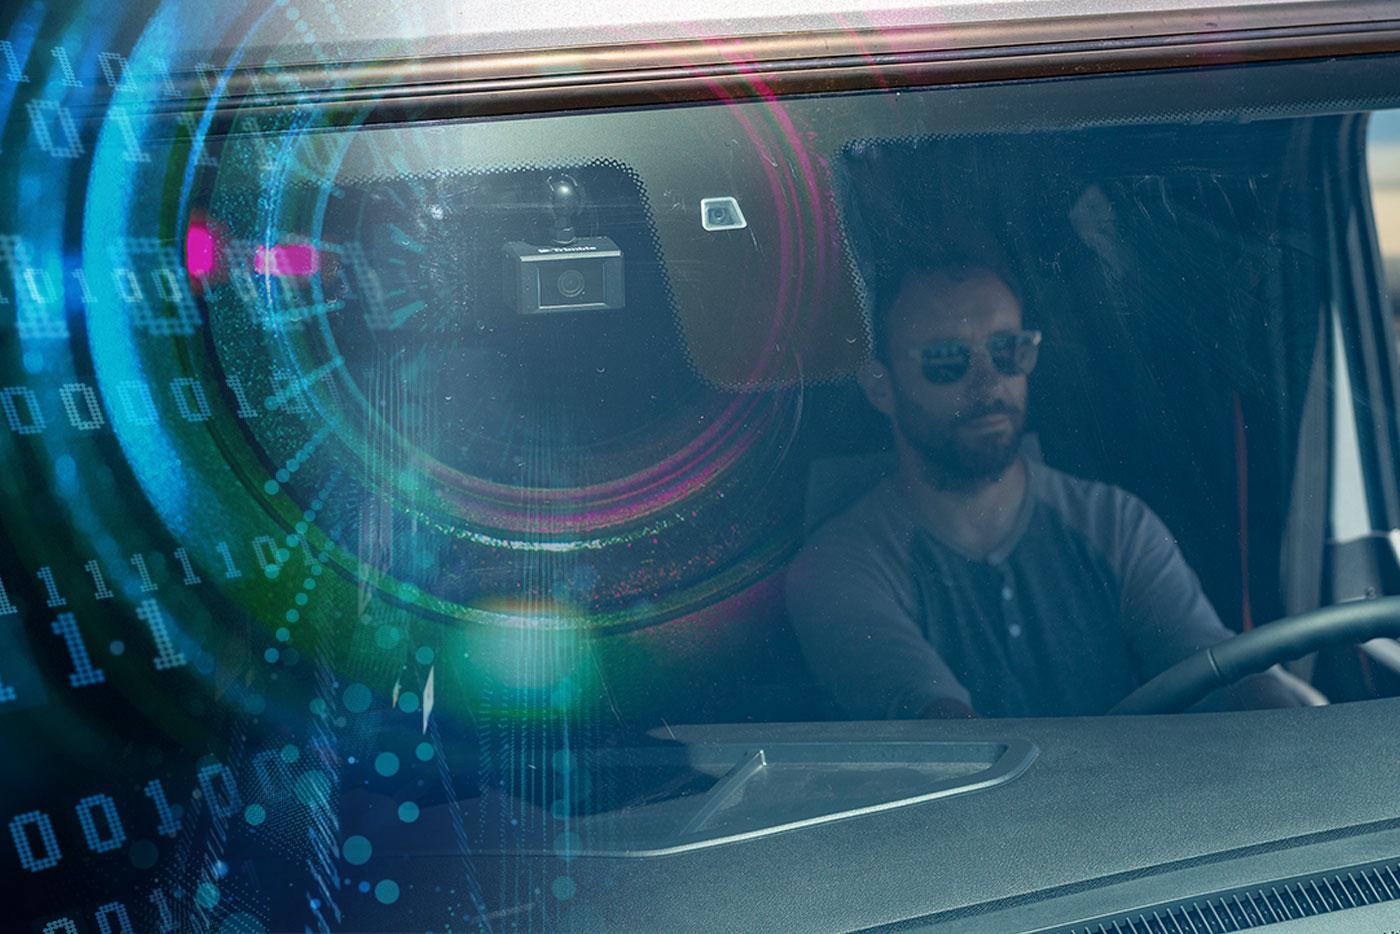 Trimble answers Truck video telematics questions